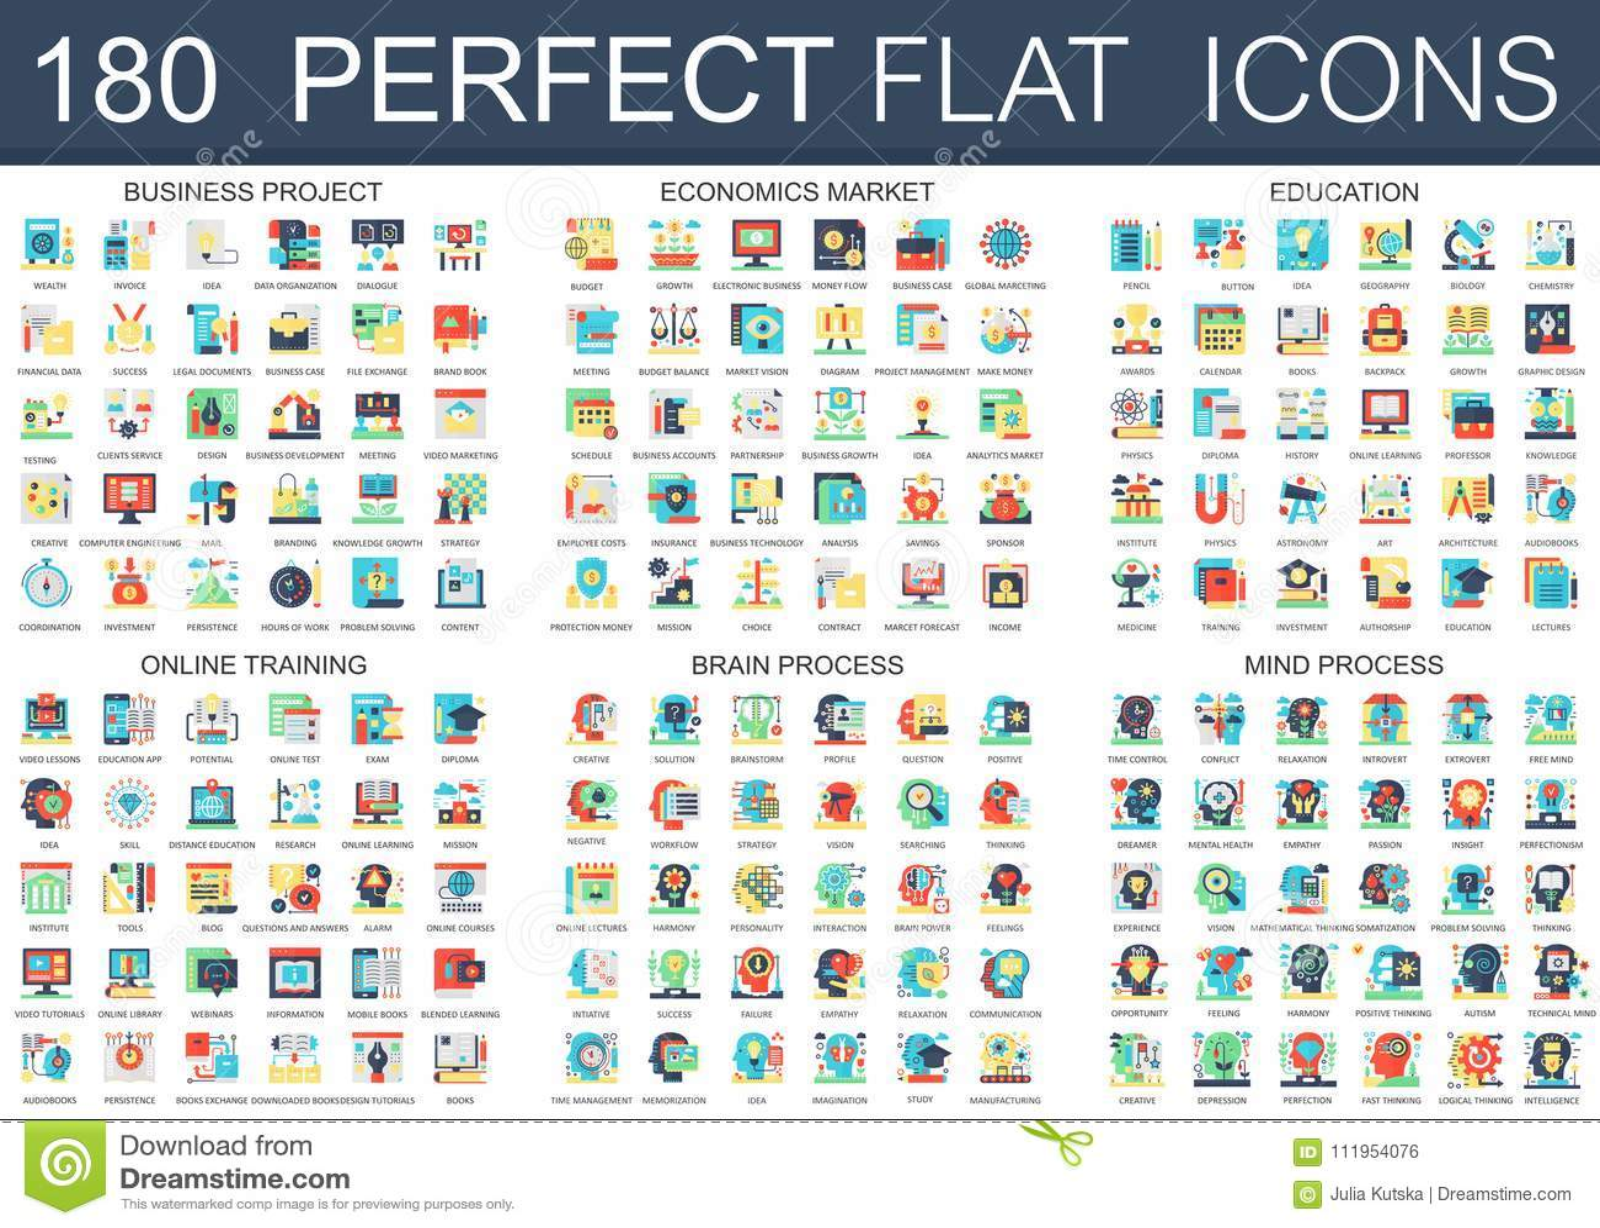 180 vector complex flat icons concept symbols of business project, economics market, education, online training, brain